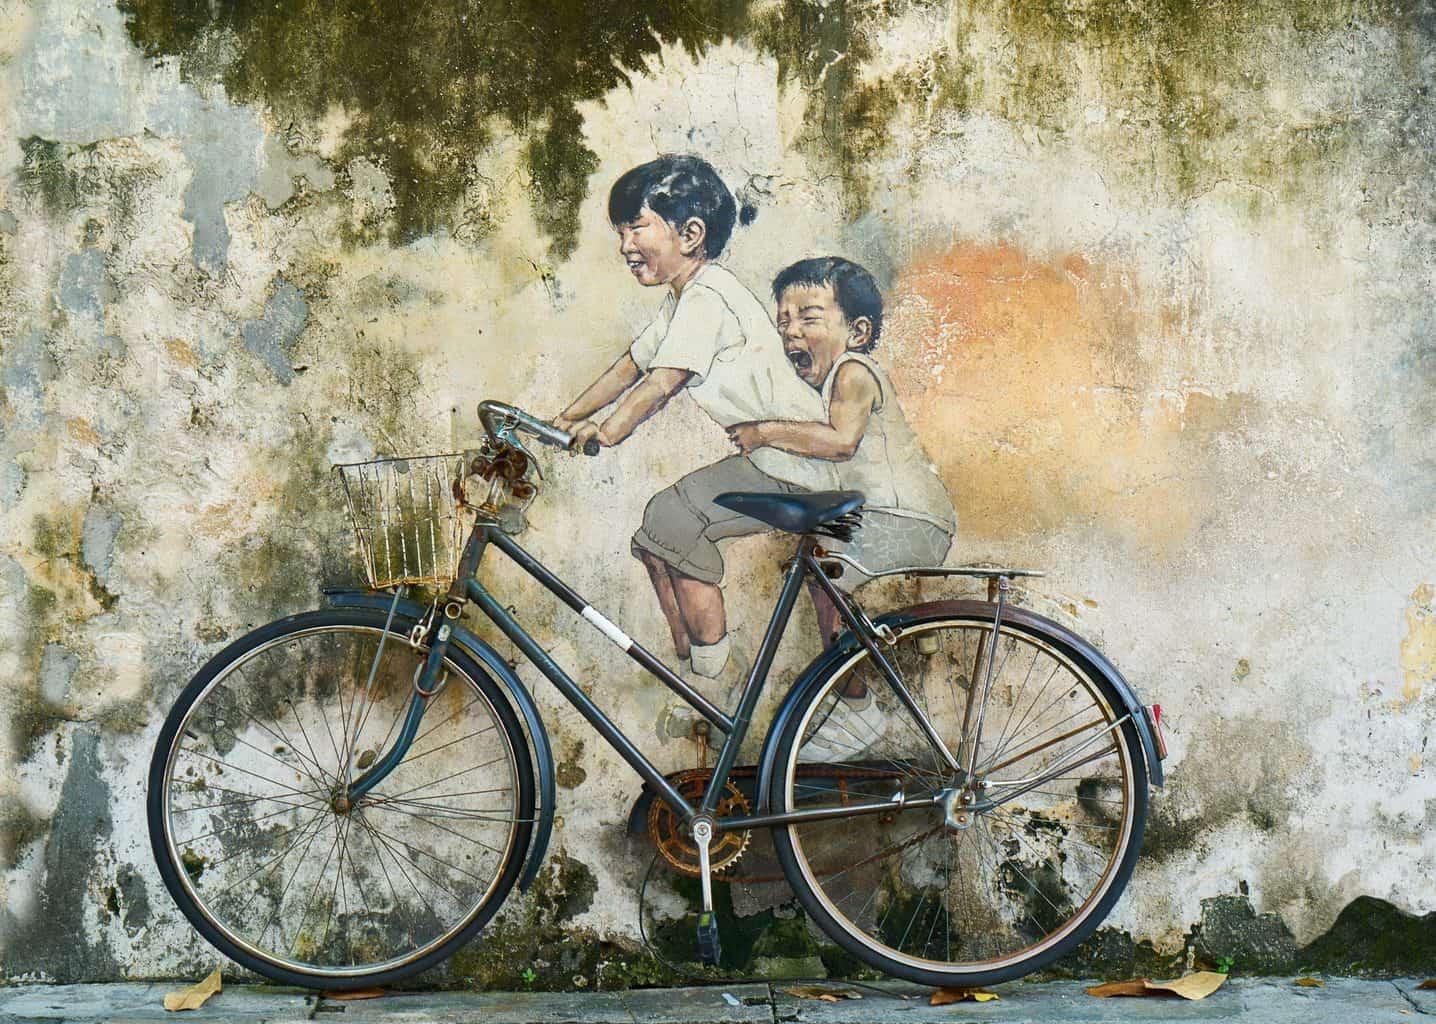 bicycle, children, graffiti